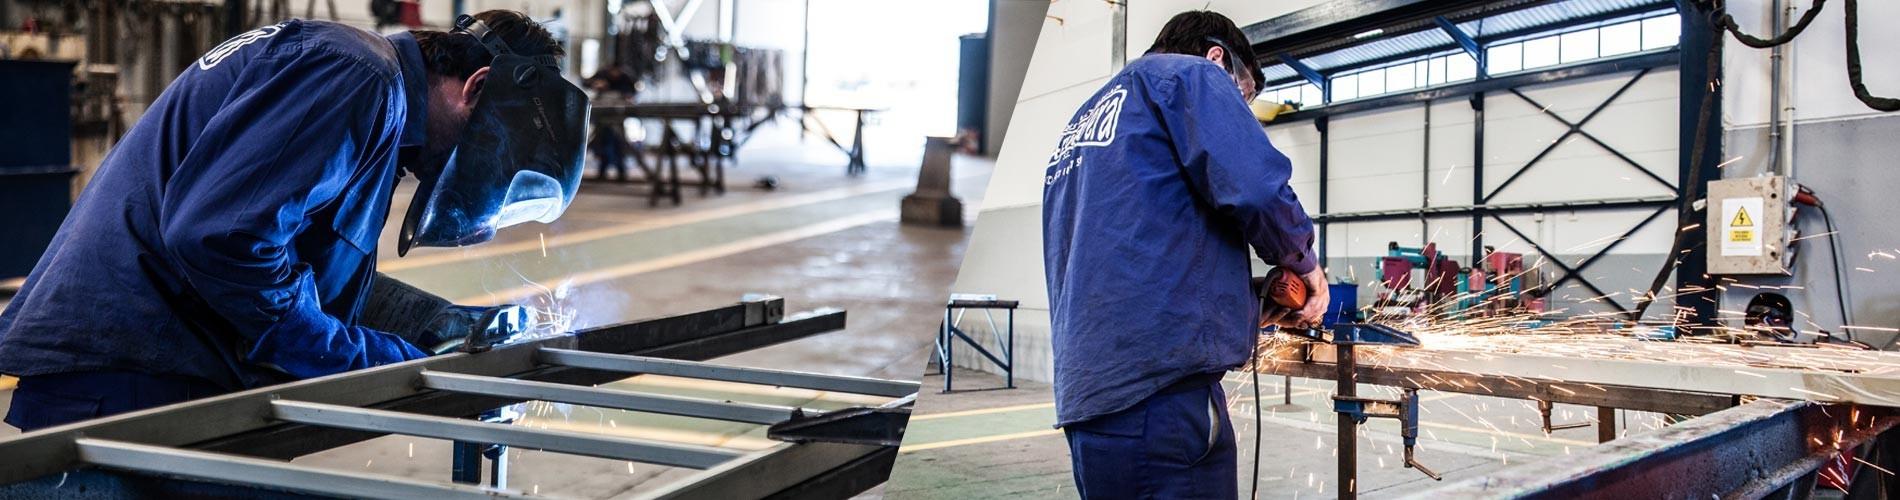 industrias metalicas cordoba